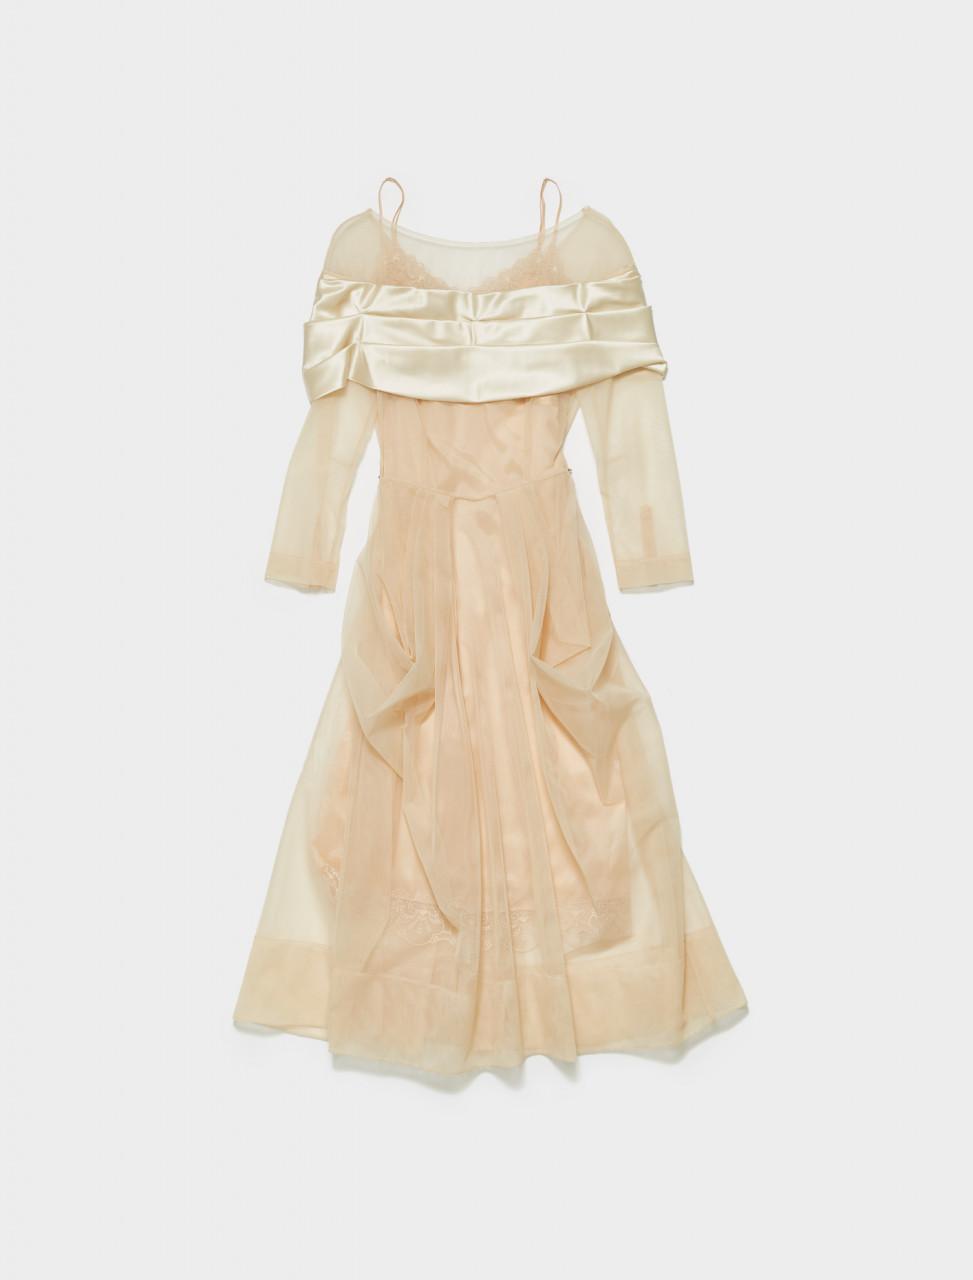 290-7011-0069 SIMONE ROCHA PLEATED POCKET DRESS NUDE CREAM